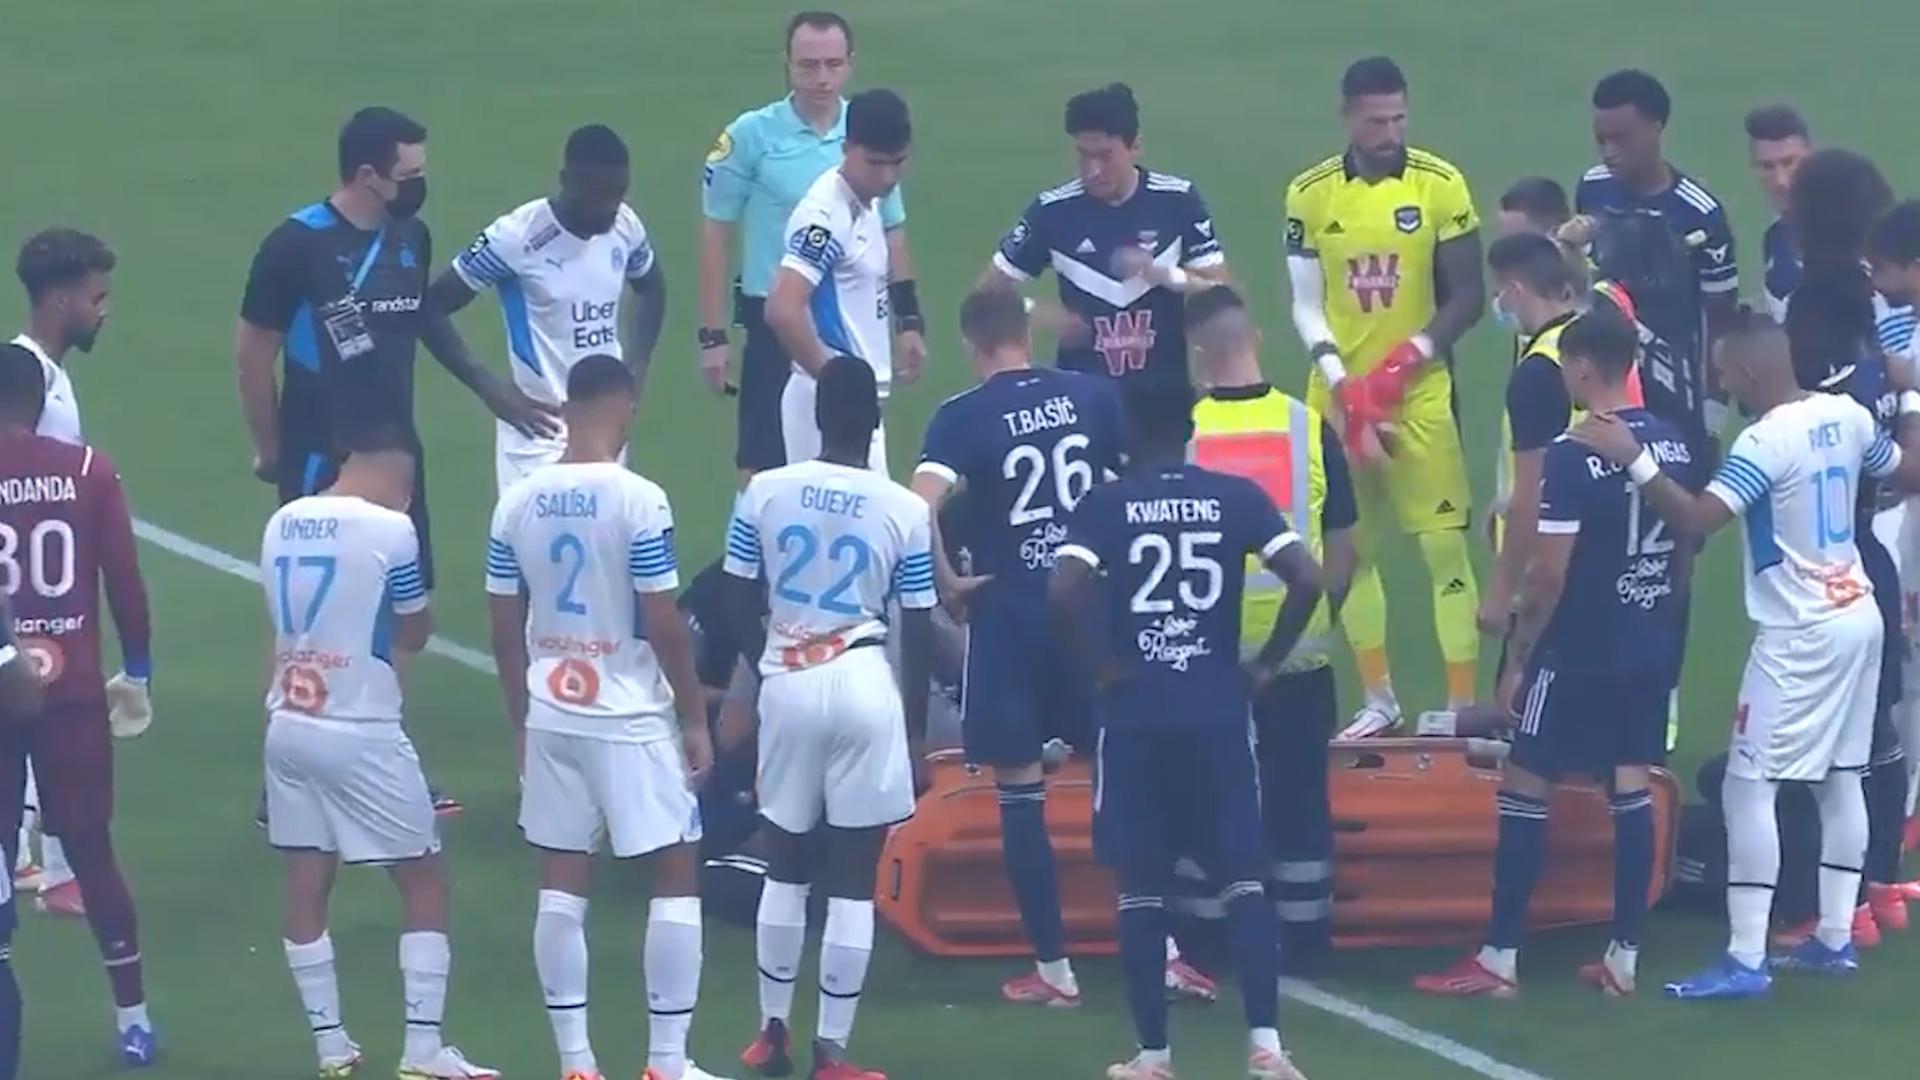 Футболист Бордо потерял сознание во время матча чемпионата Франции